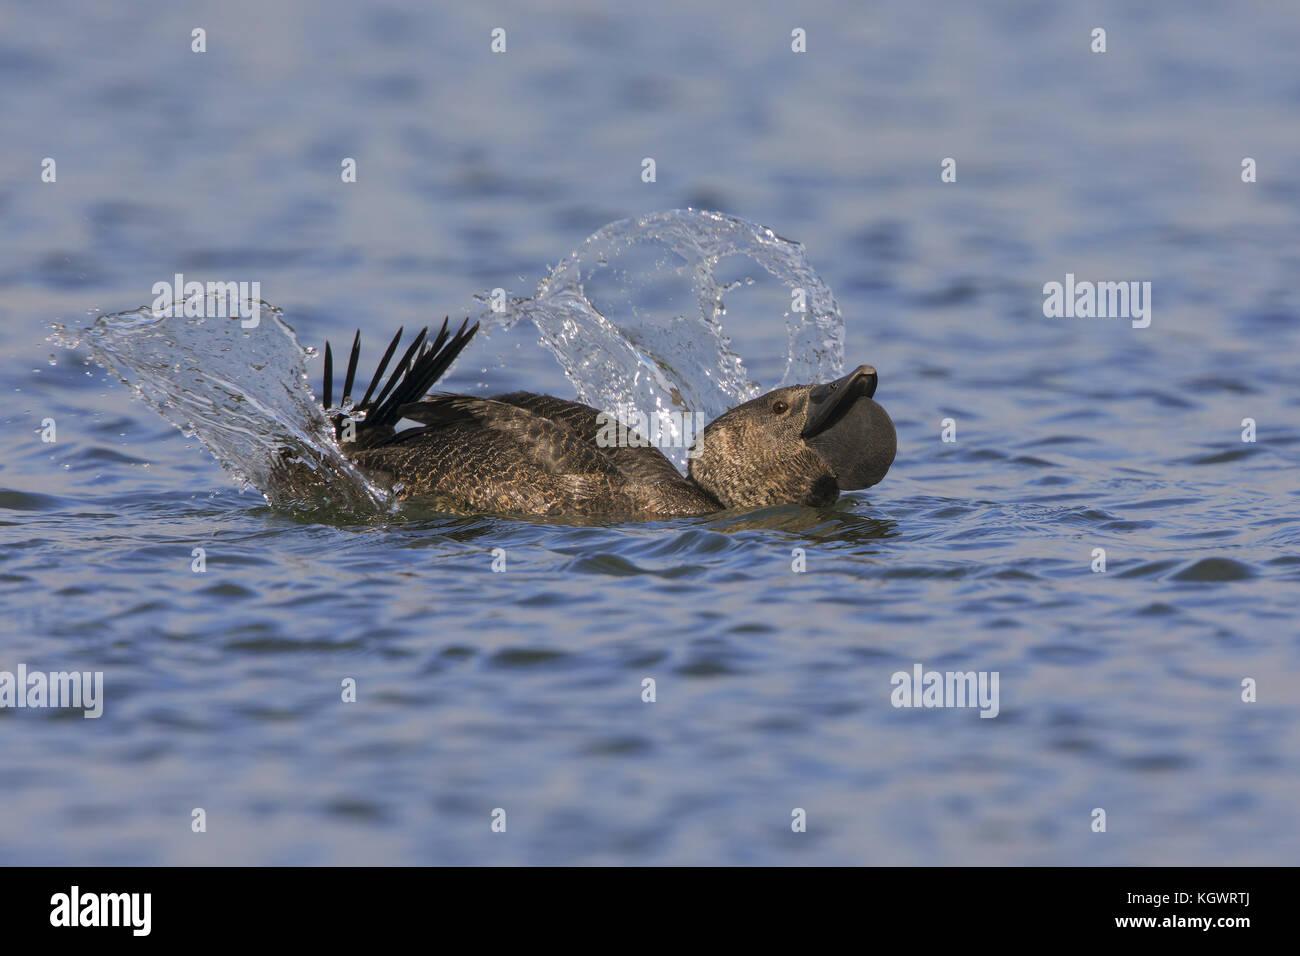 Pato almizclero drake mostrar cerca de un grupo de mujeres, el Lago Monger en Perth, Australia Occidental Imagen De Stock